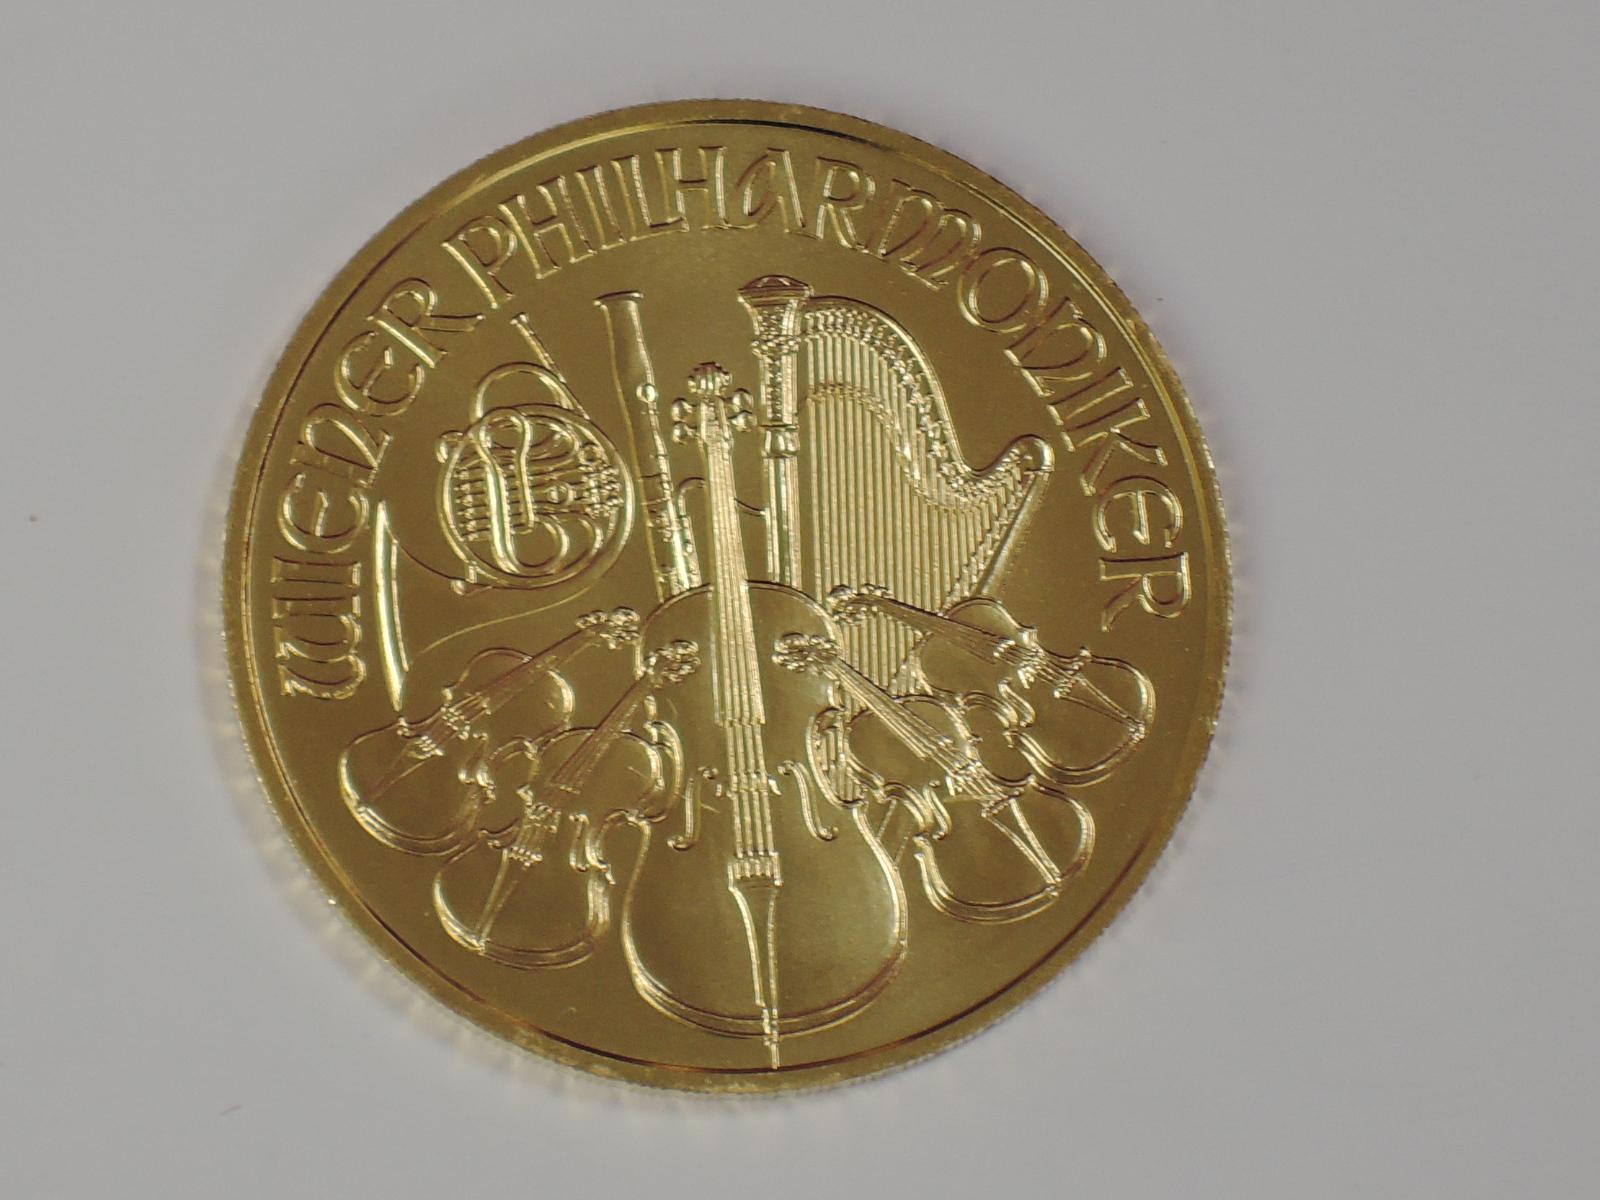 Lot 649 - A gold 1oz 2017 Austria 100 Euro Winer Philharmoniker coin, in plastic case